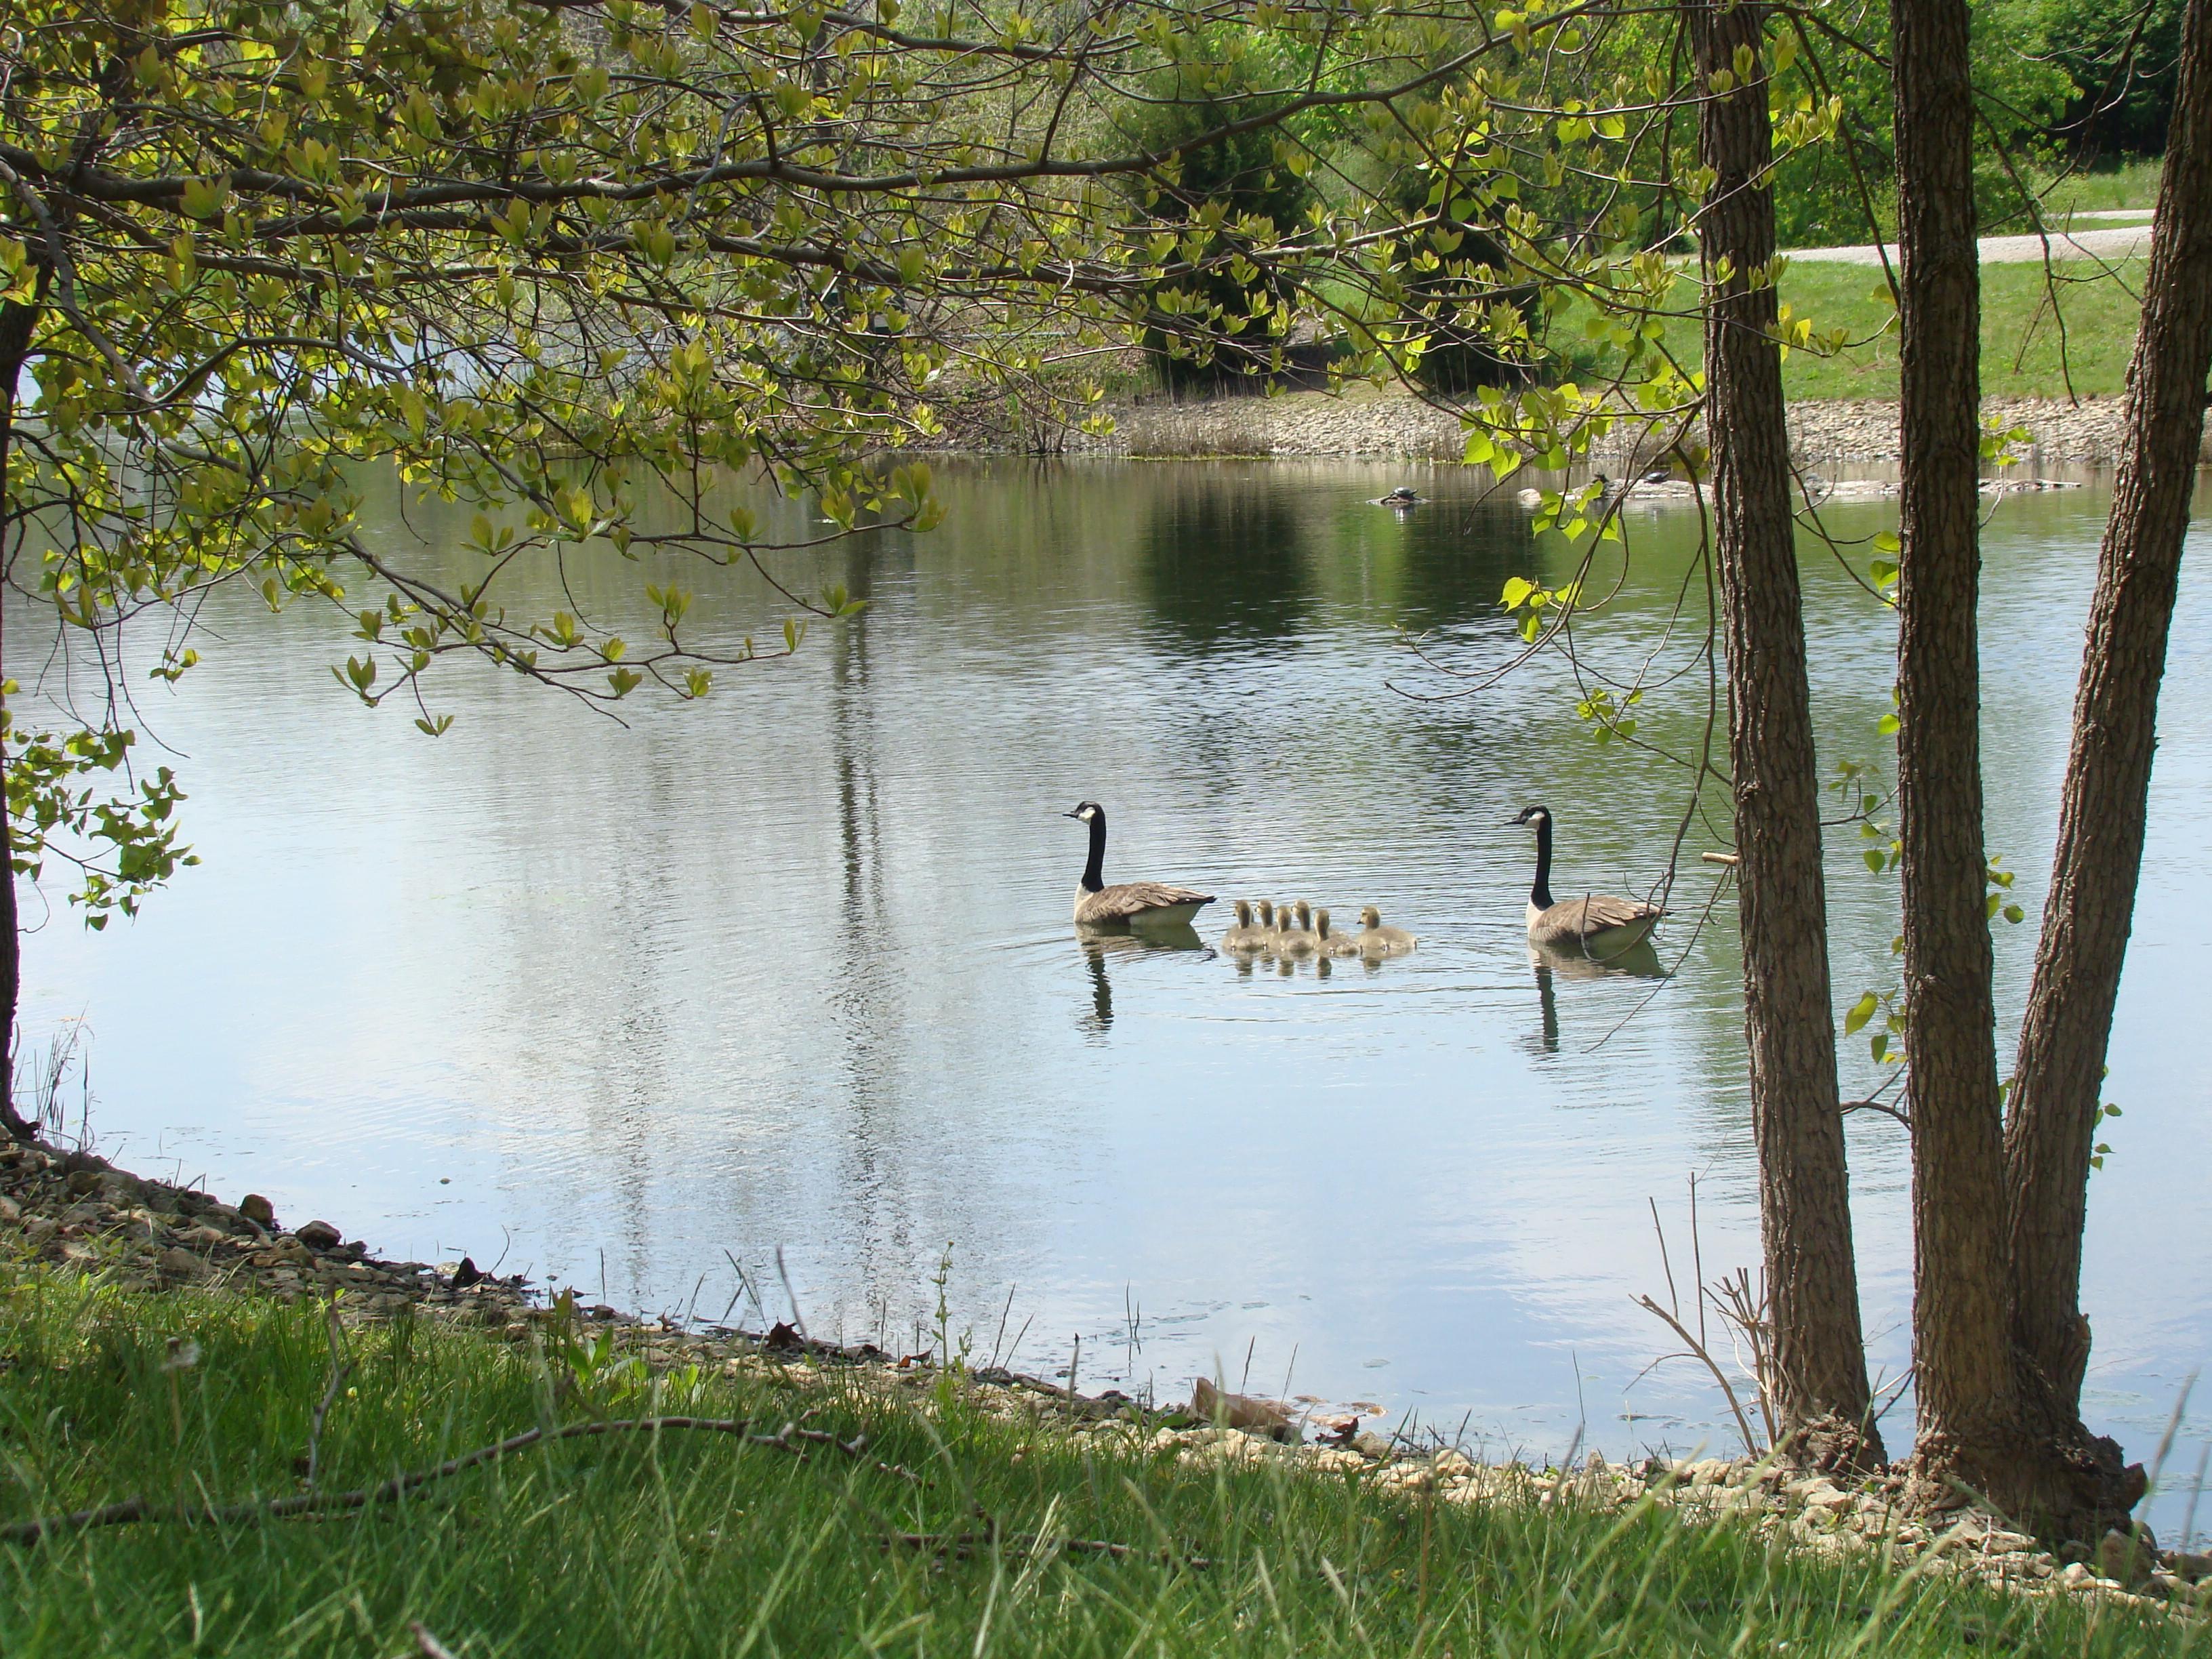 Chadwick Arboretum and Learning Gardens, Arboretum, Ohio State, Water, Tree, HQ Photo